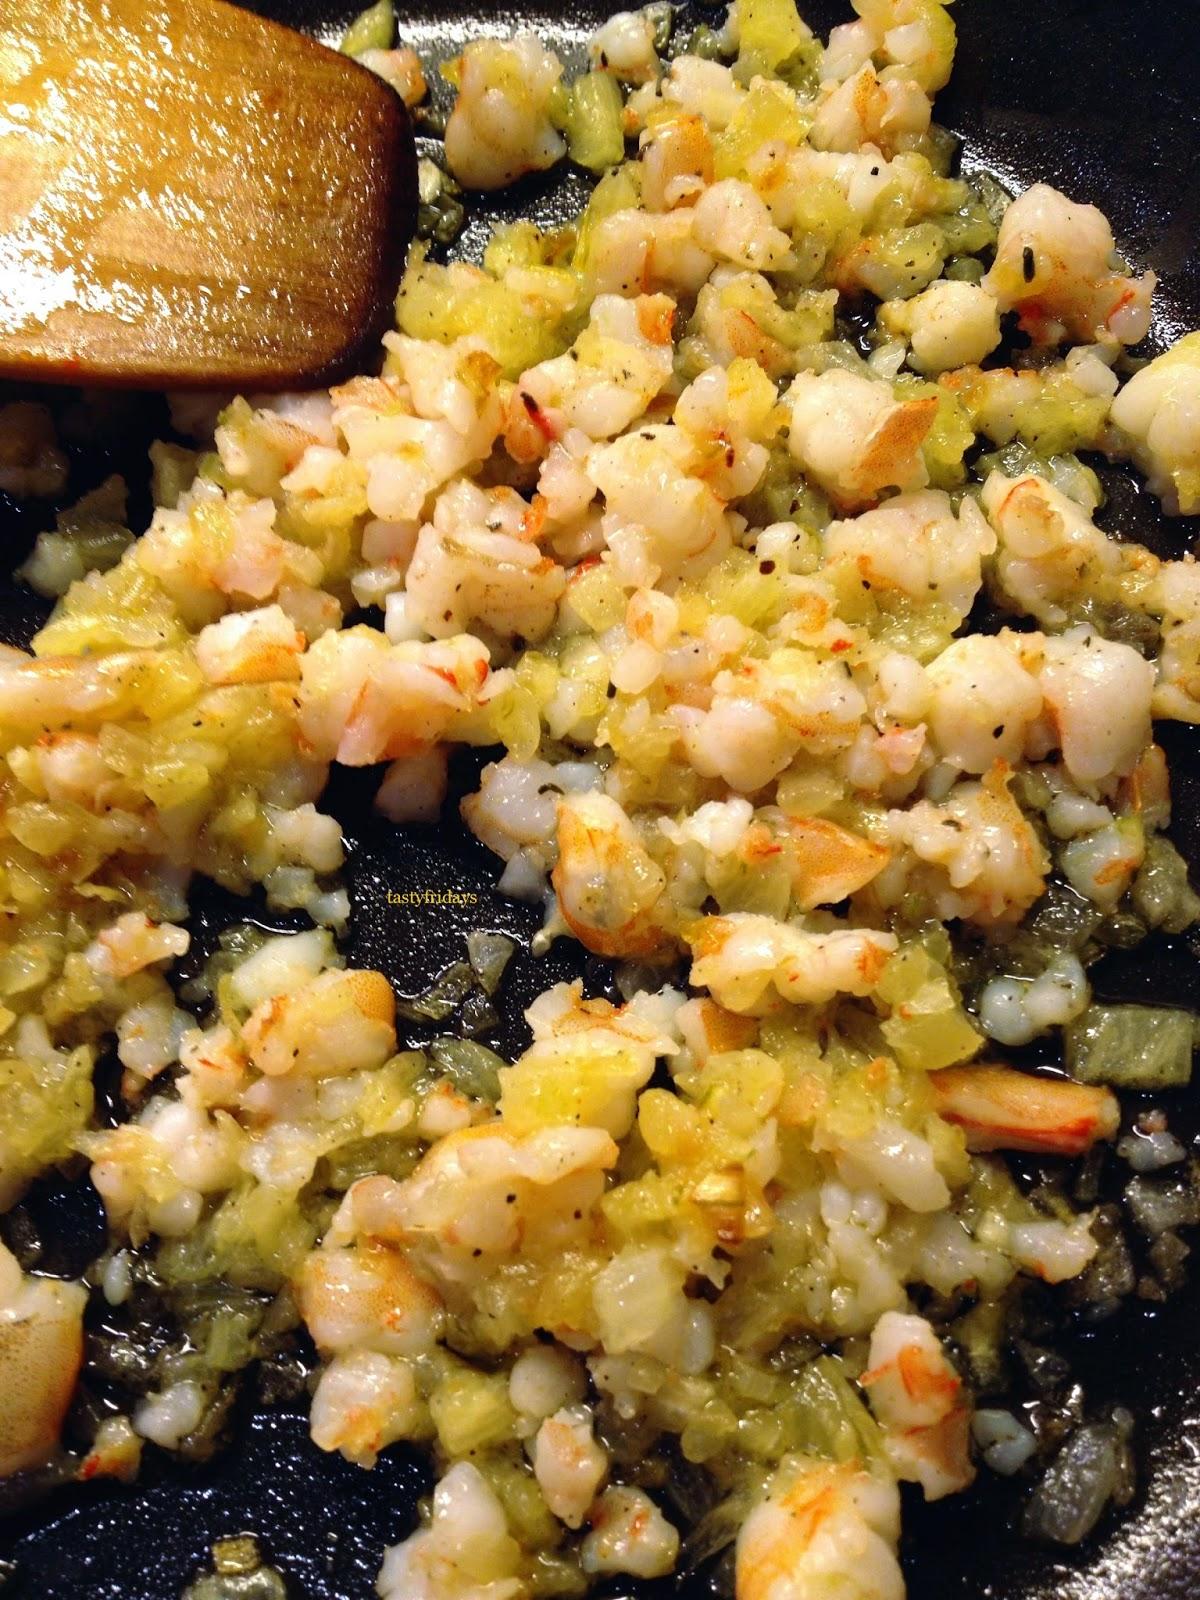 Tasty fridays calamares rellenos - Limpiar calamares pequenos ...